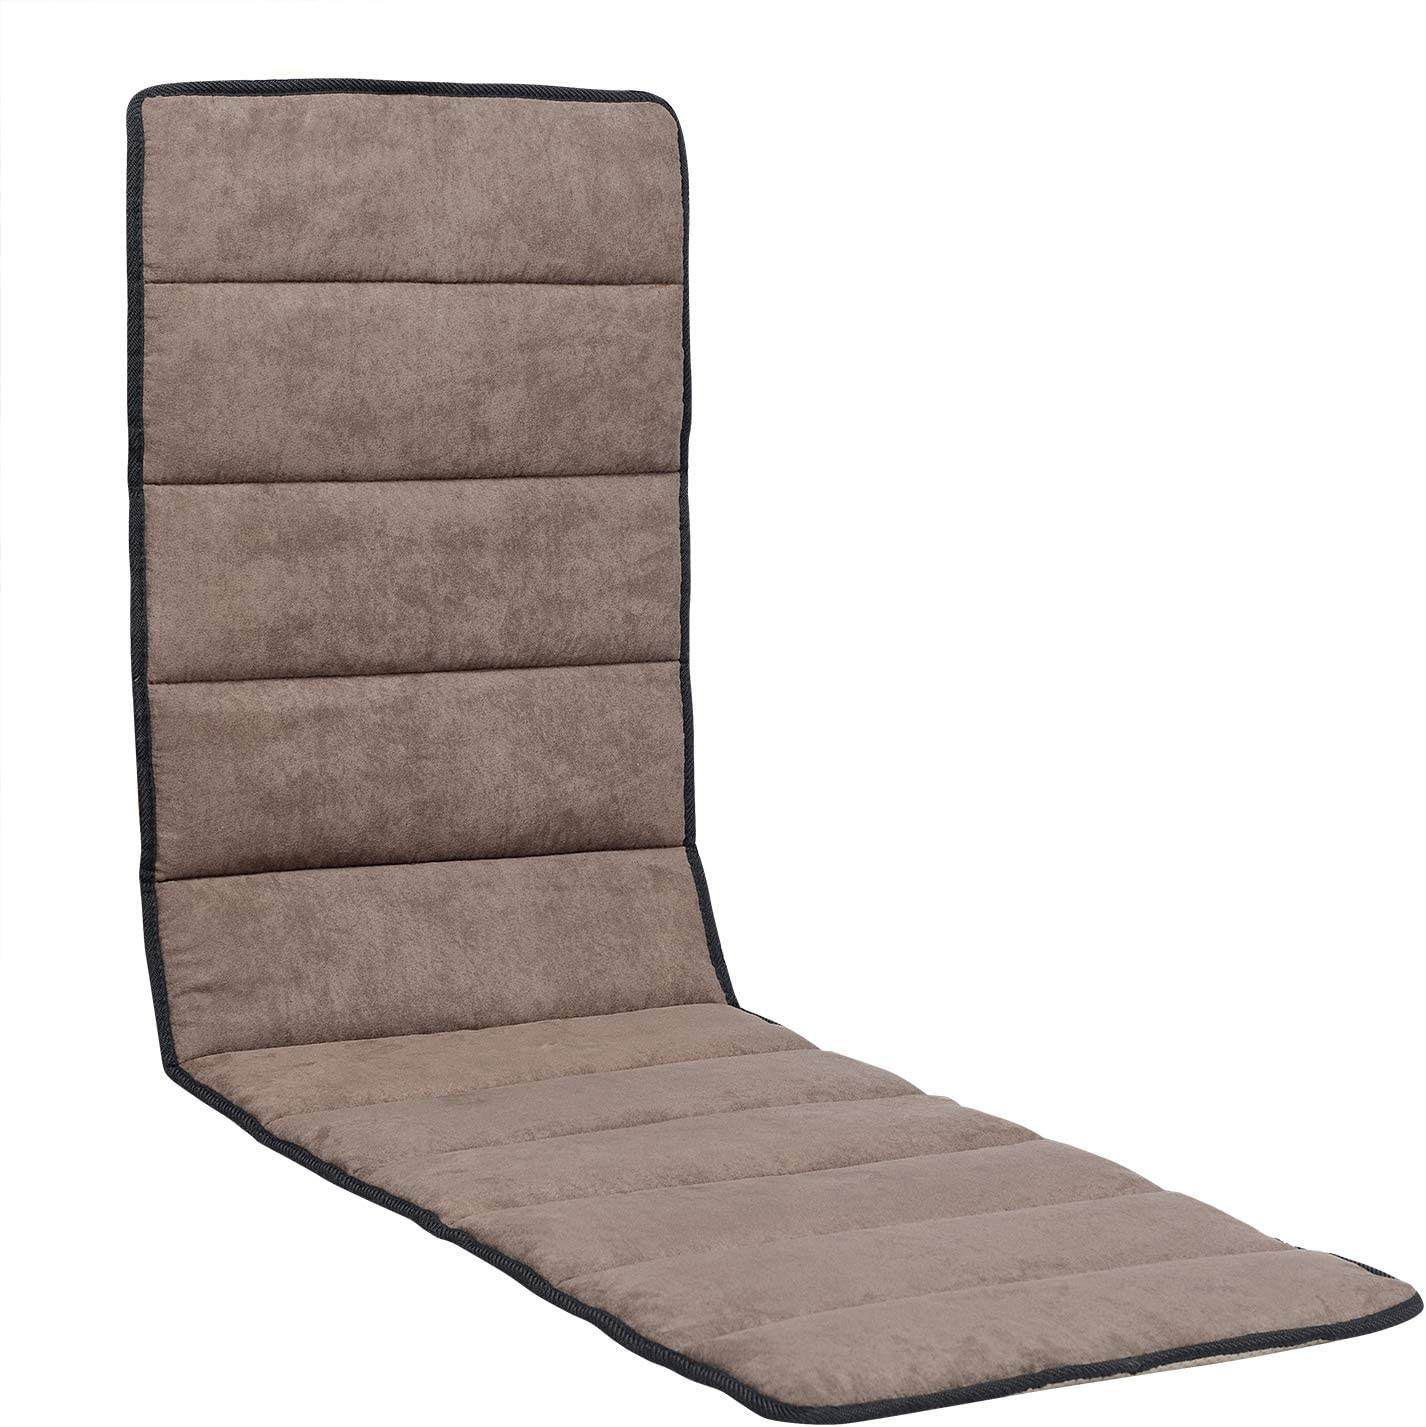 Removable Garden Lounger Recliner Pad Outdoor Office Deck Chair Cushion Seat Mat